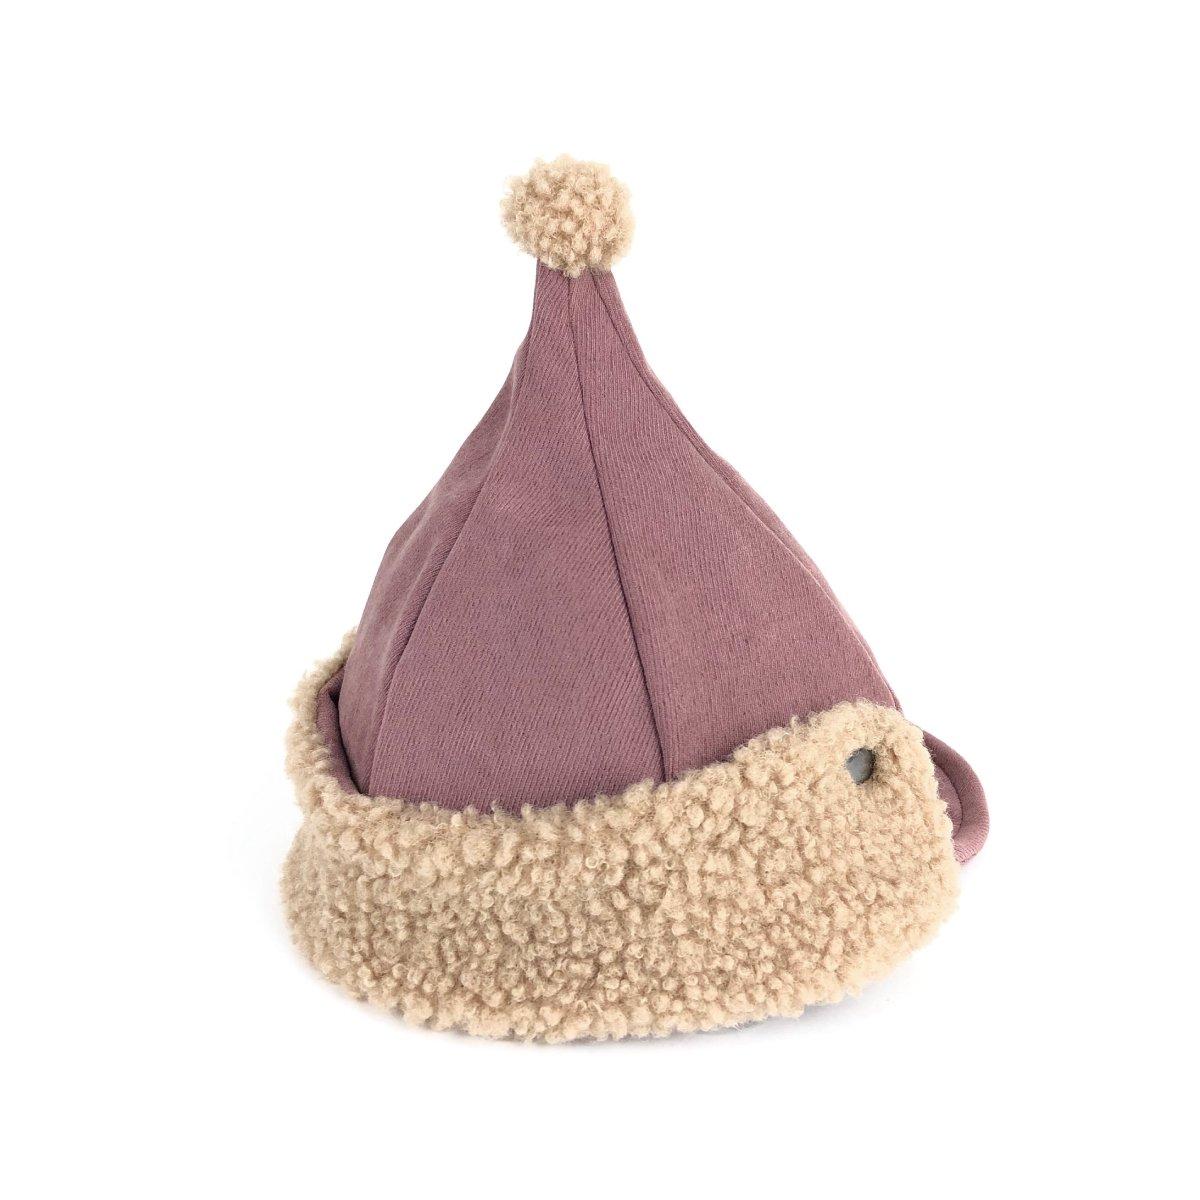 【KIDS】Tongari Ear Pon Cap 詳細画像4